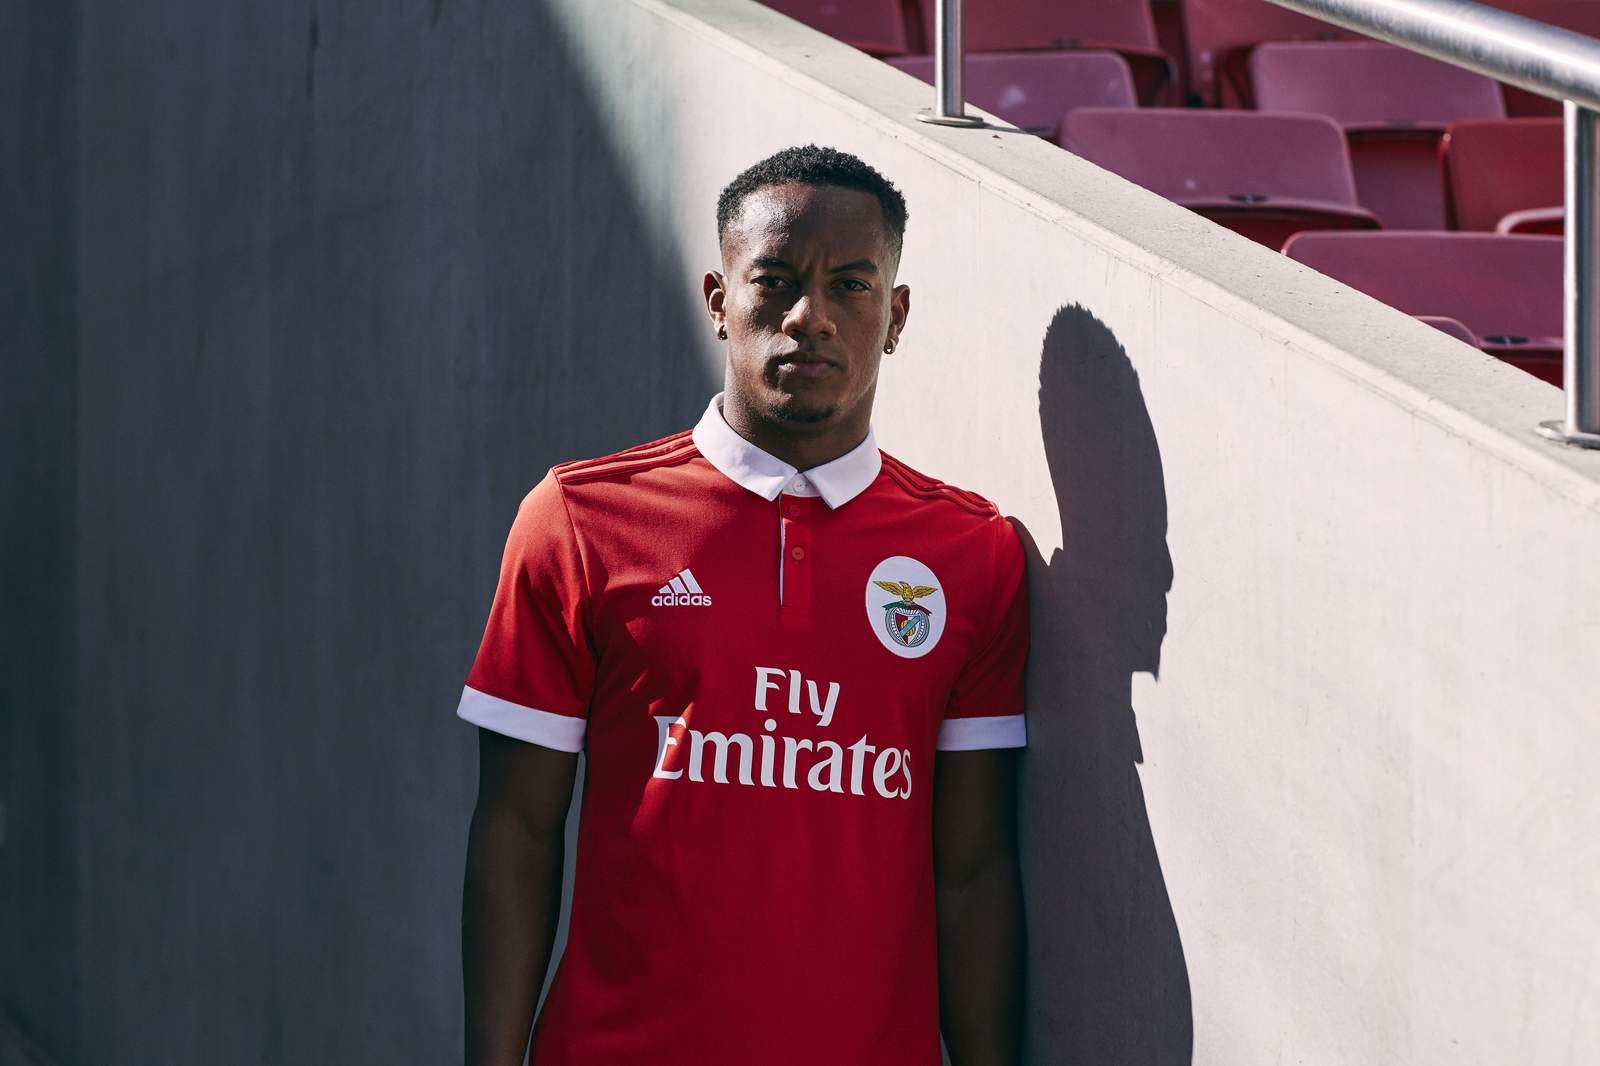 new york 41dde 58f71 Benfica 17-18 Home Kit Revealed - Footy Headlines